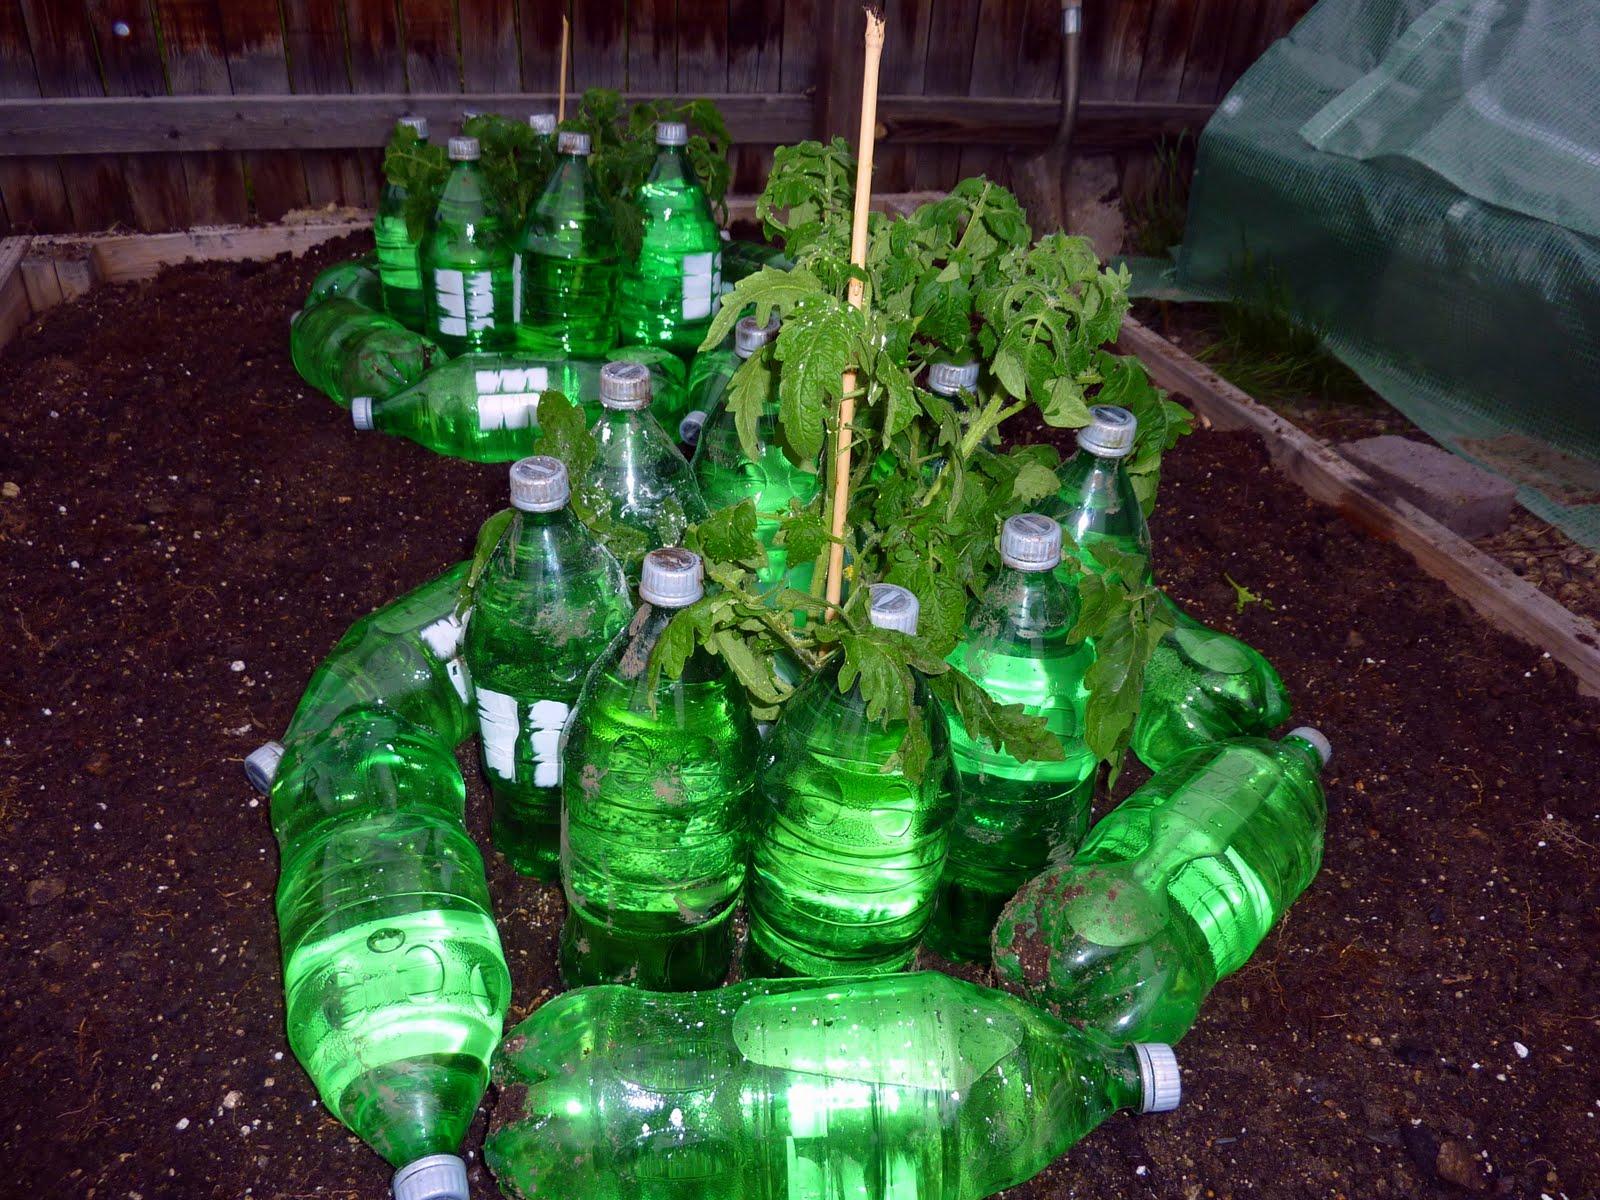 http://1.bp.blogspot.com/-rtU0Lq2DxNs/Ta0AxYWc3gI/AAAAAAAABnU/R7MTsM-uwGg/s1600/early+tomato+wall+of+water+soda+bottles.jpg